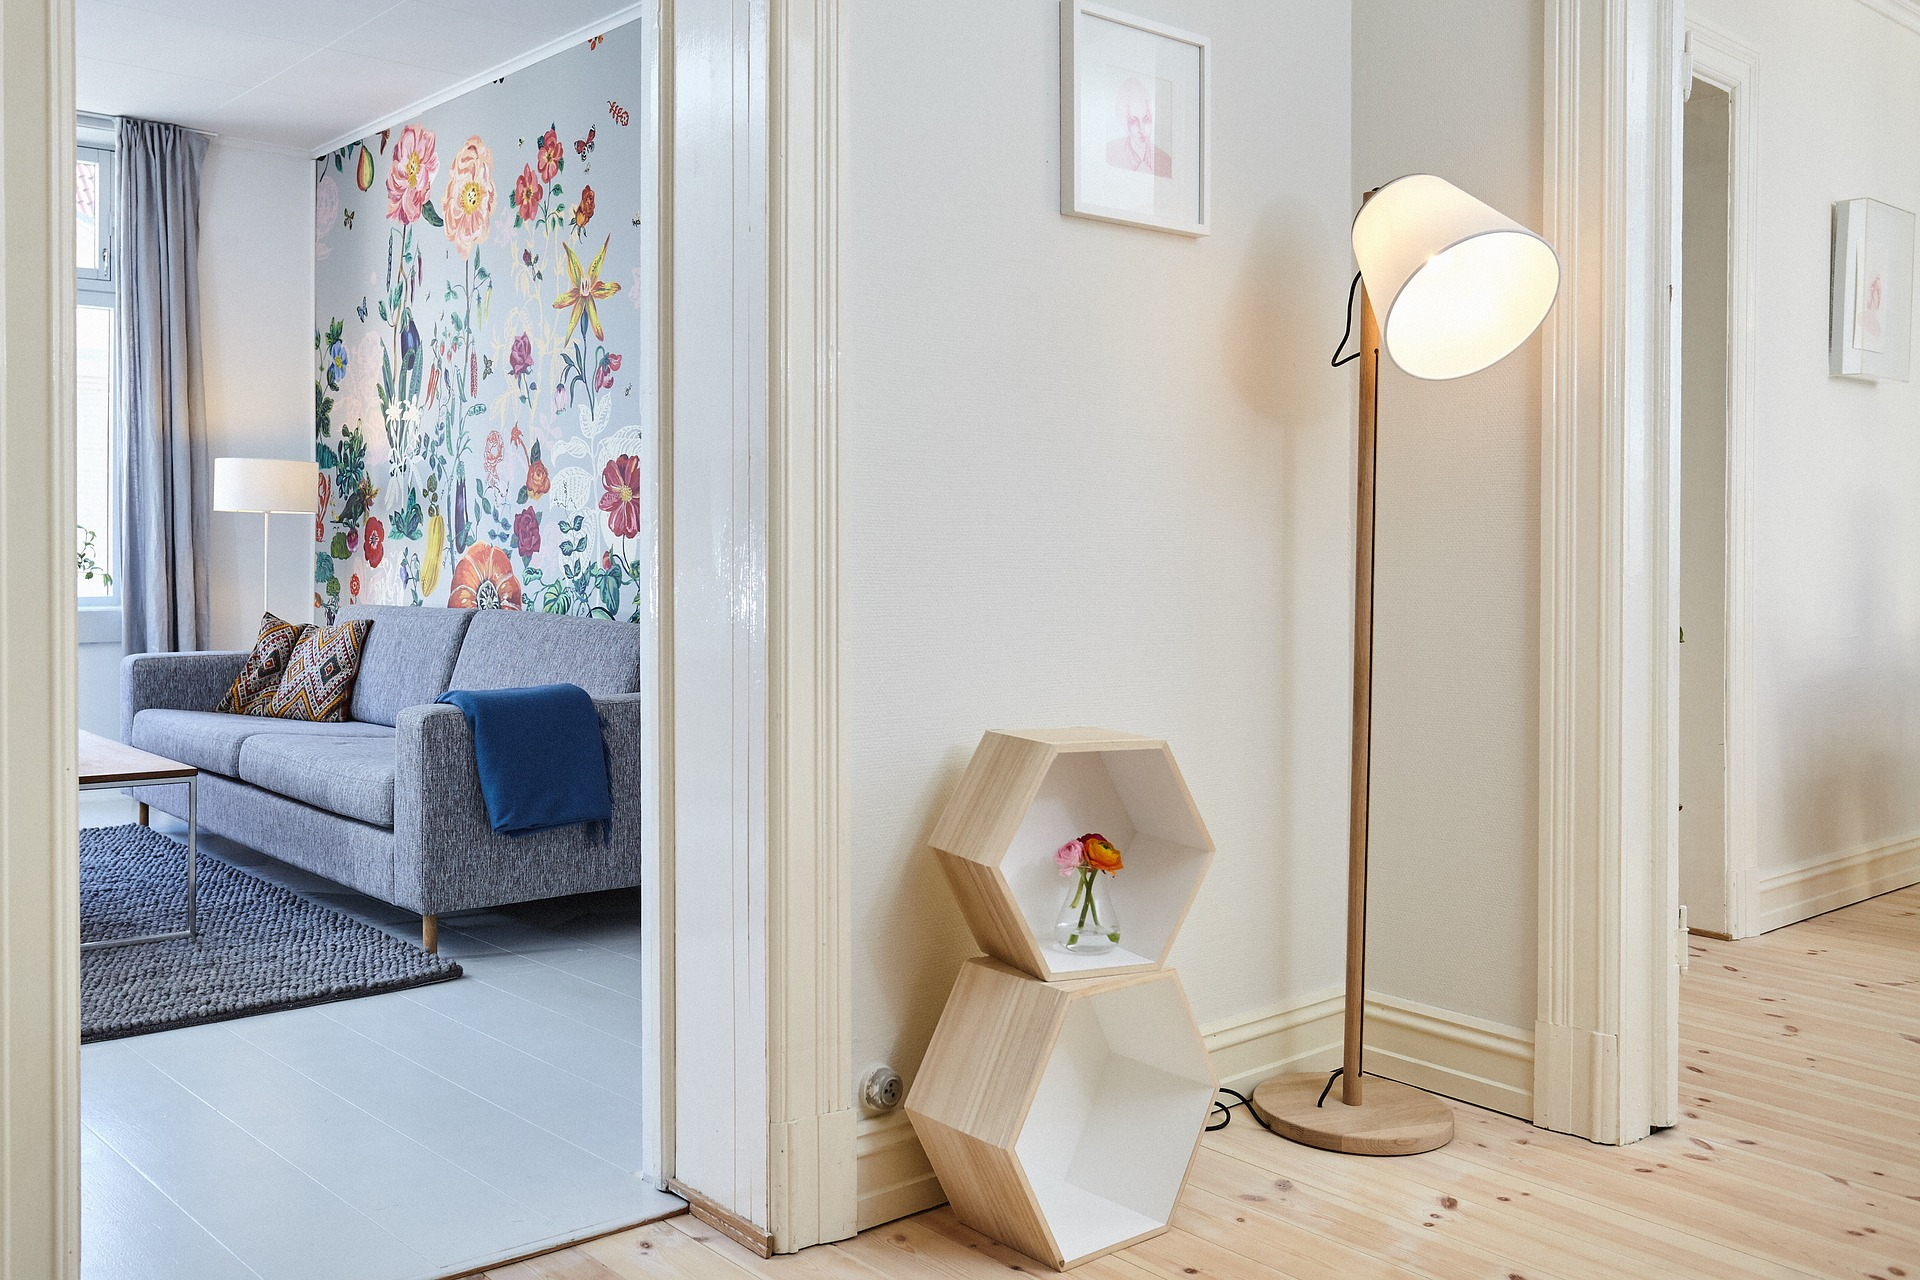 Artistic Home Decor